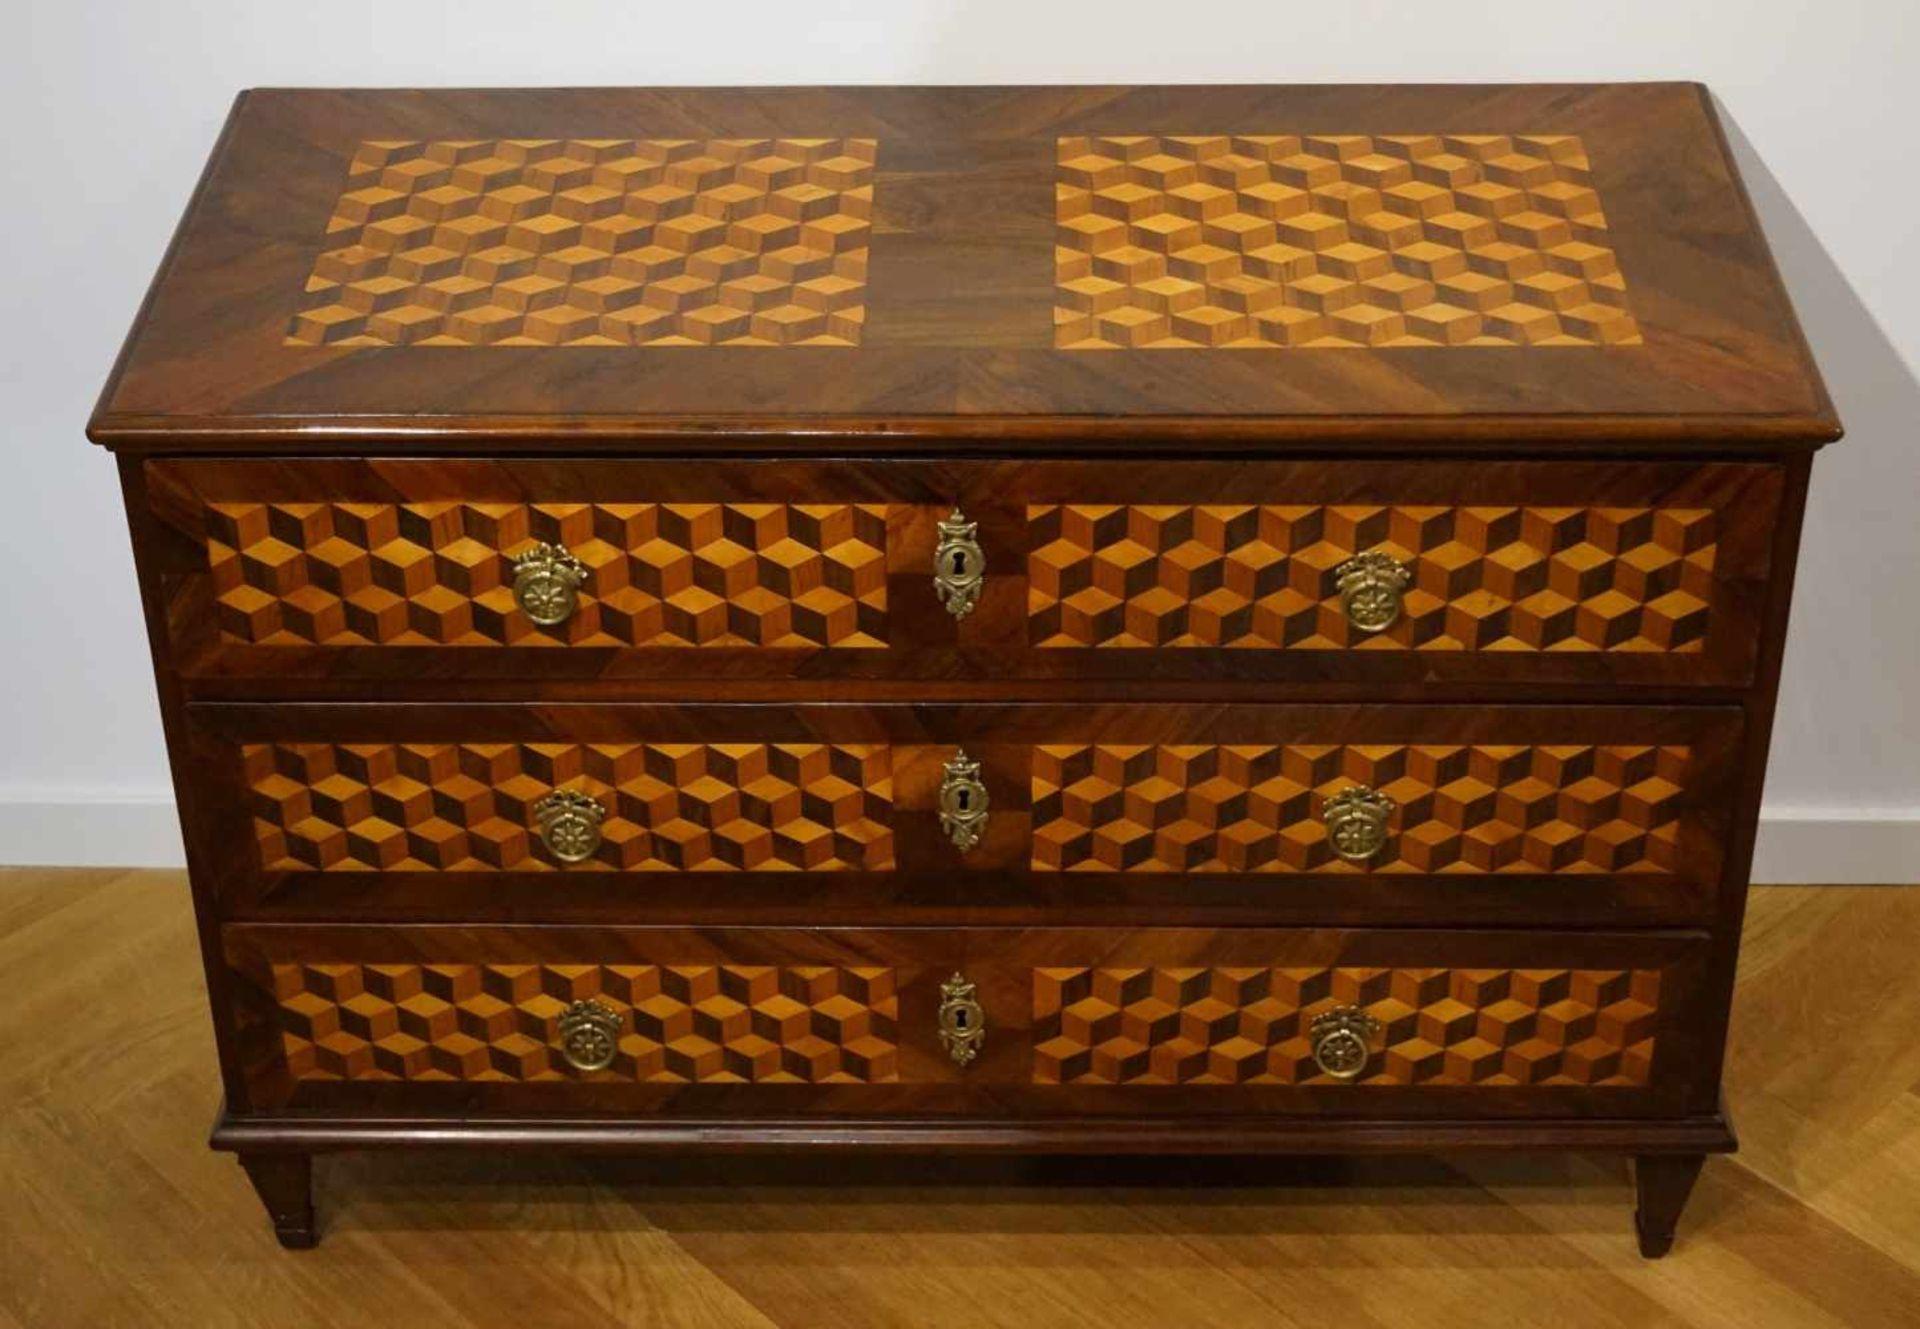 Kommode, Klassizismus, um 1800, Intarsie in Würfeloptik Kommode, Klassizismus, um 1800,